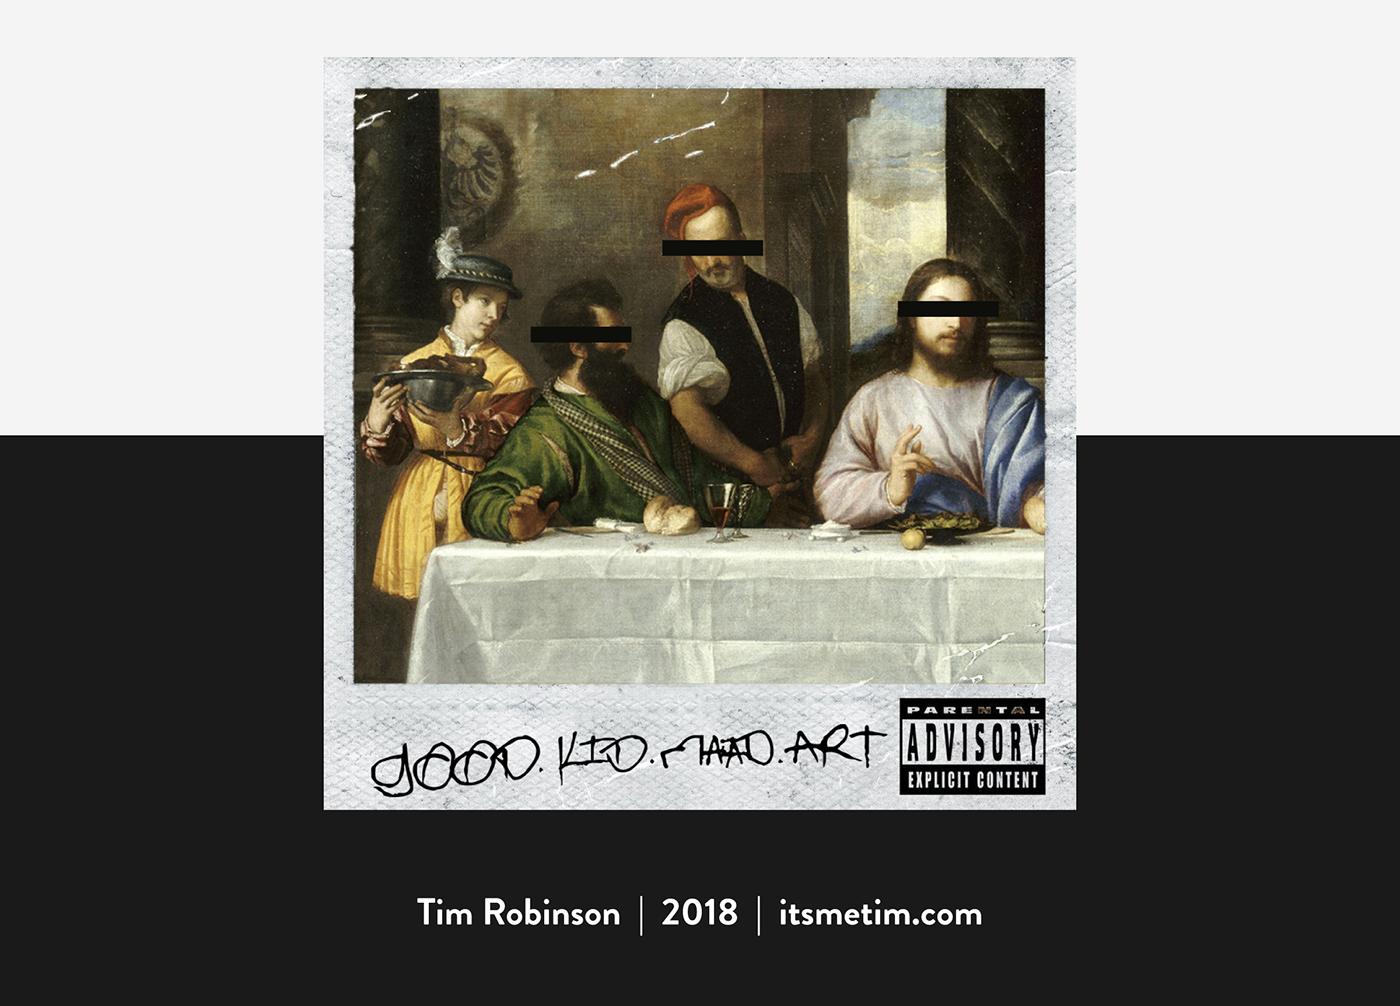 hip hop kendrick lamar good kid mad city Mad Art